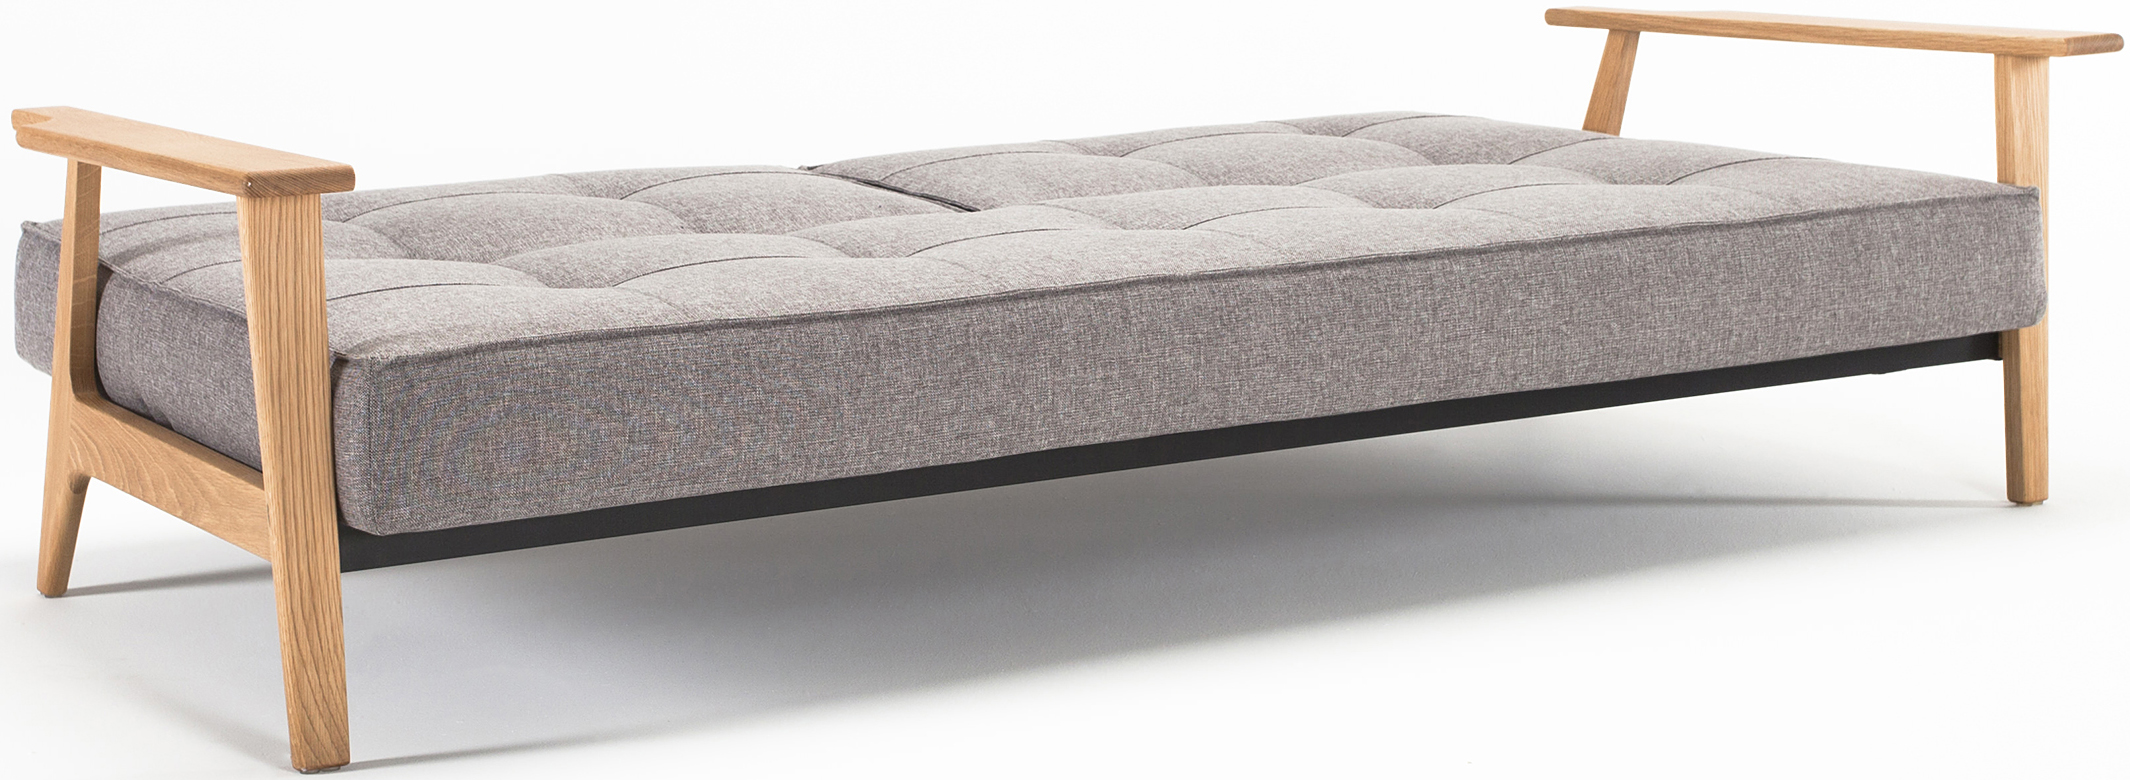 splitback sofa mixed dance grey